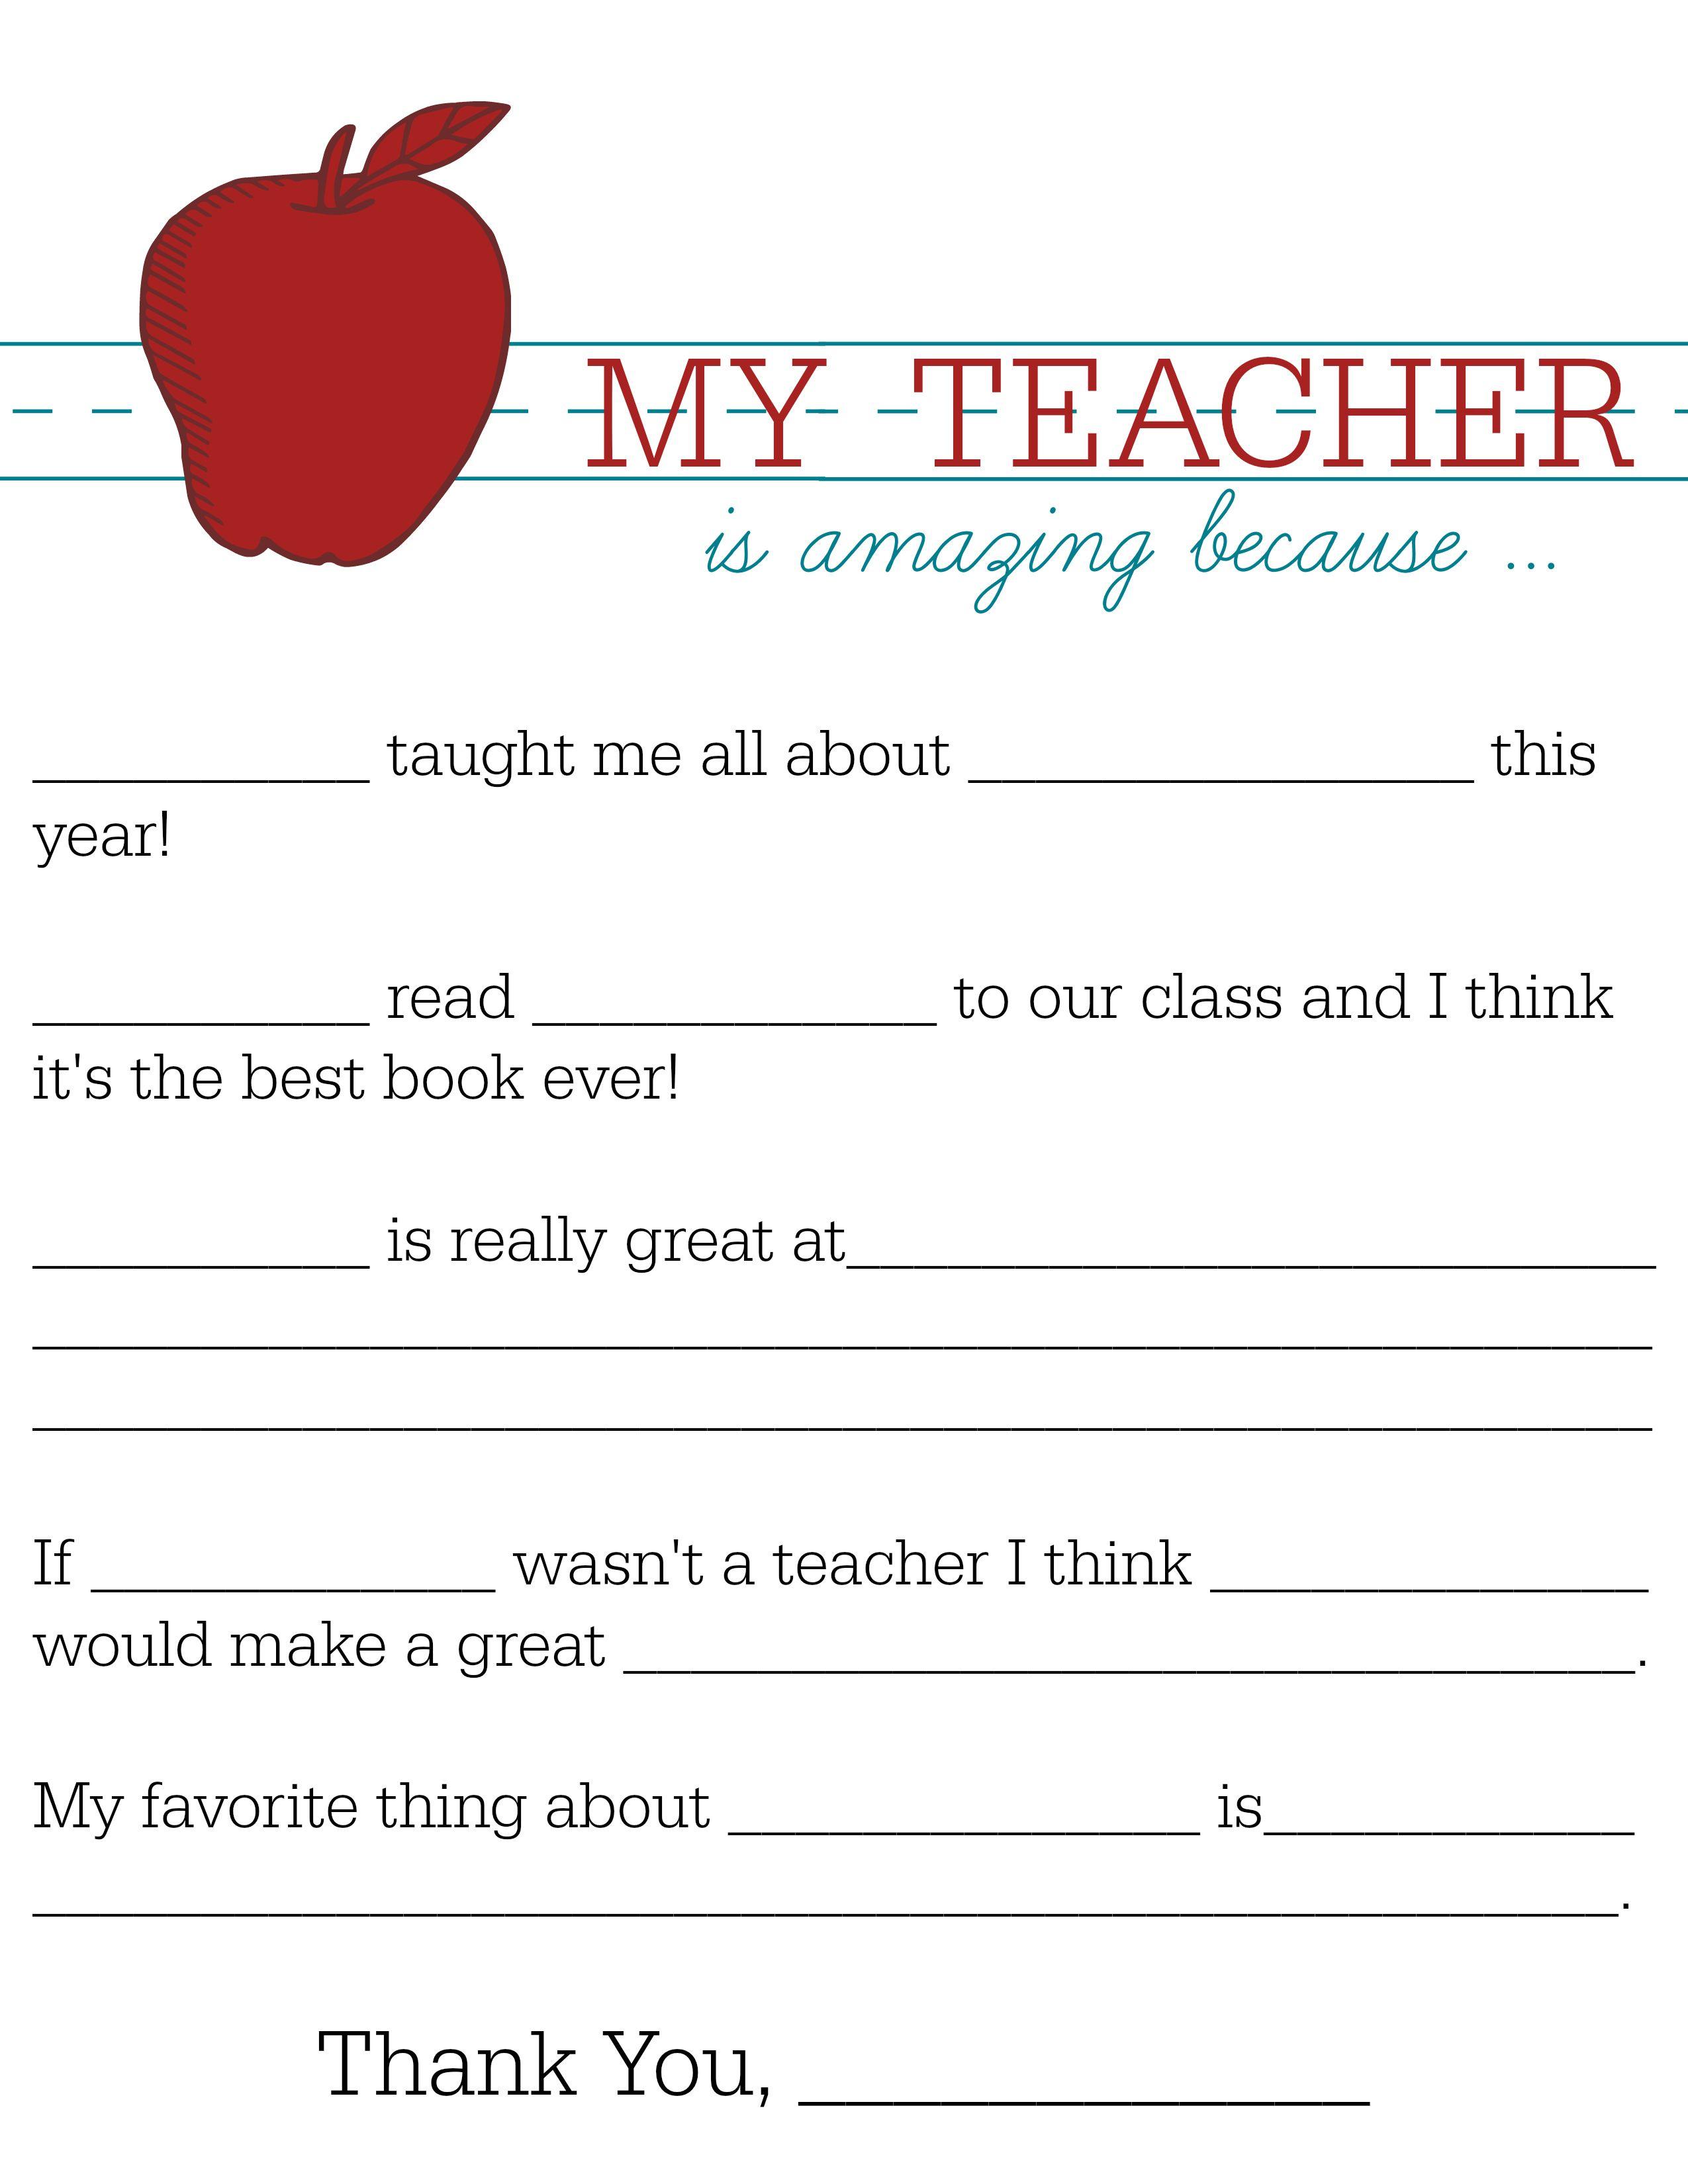 All About My Teacher Appreciation Teacher And Child